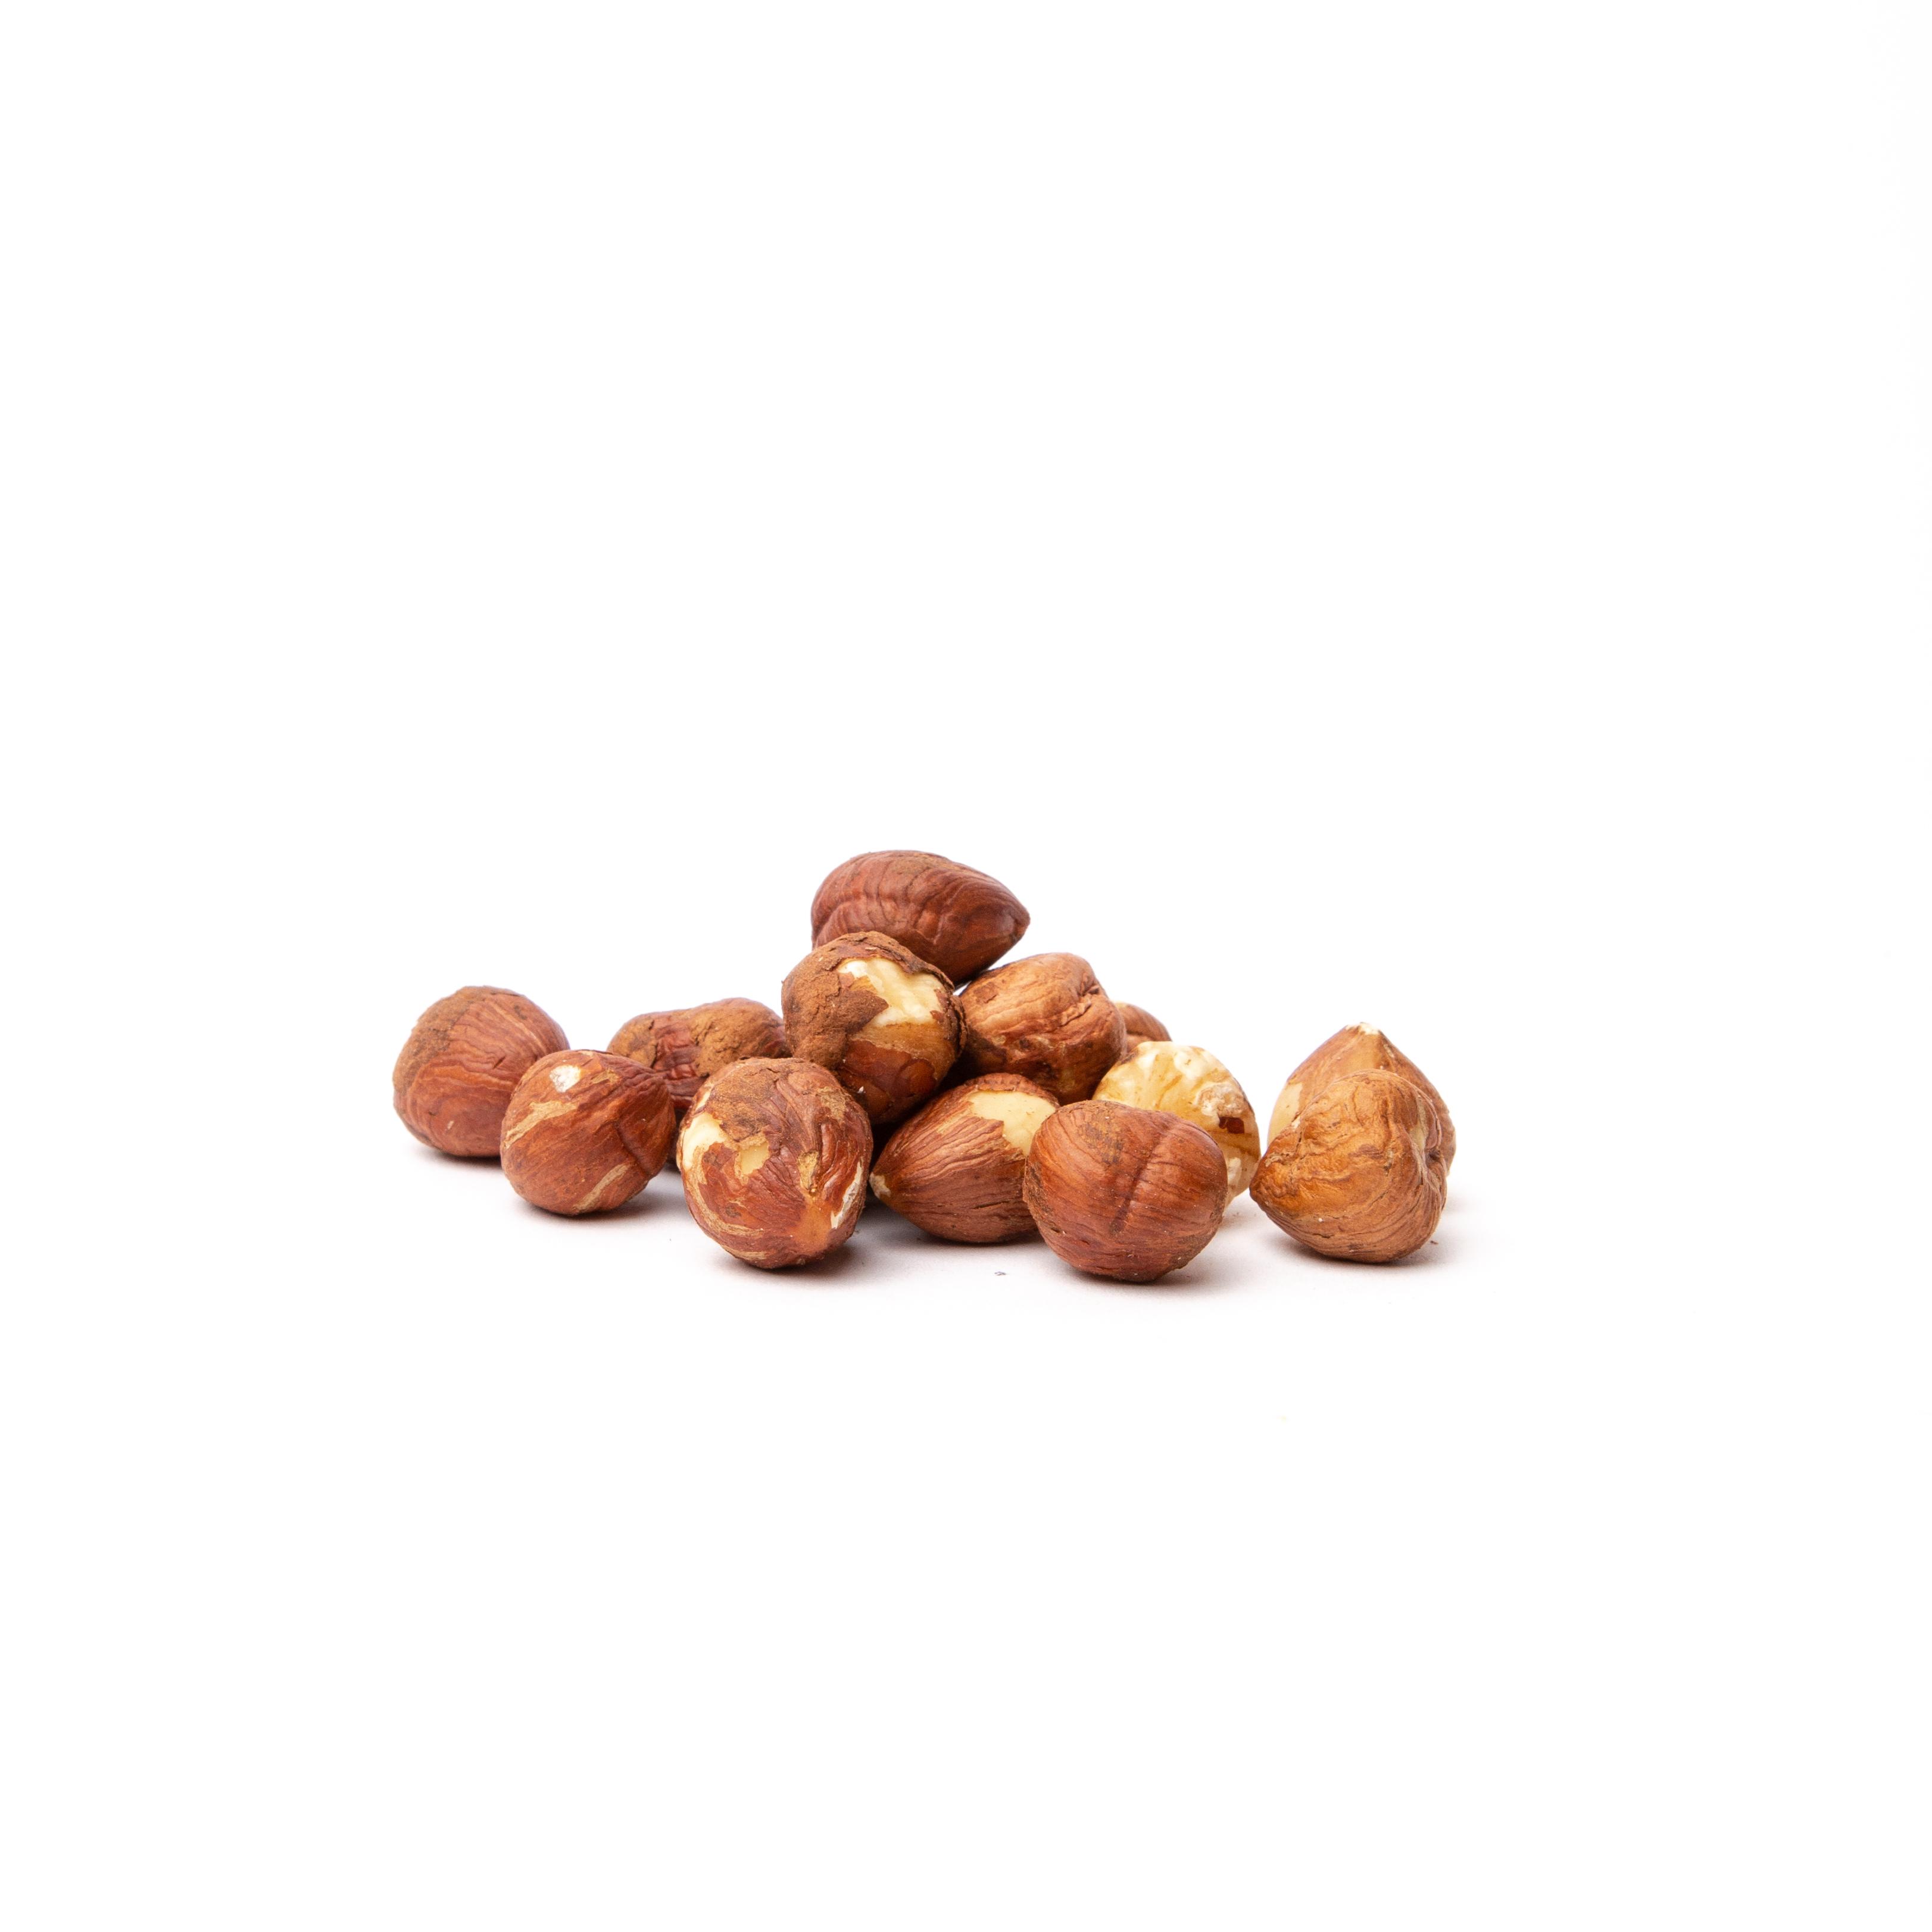 Hazelnuts: Unroasted